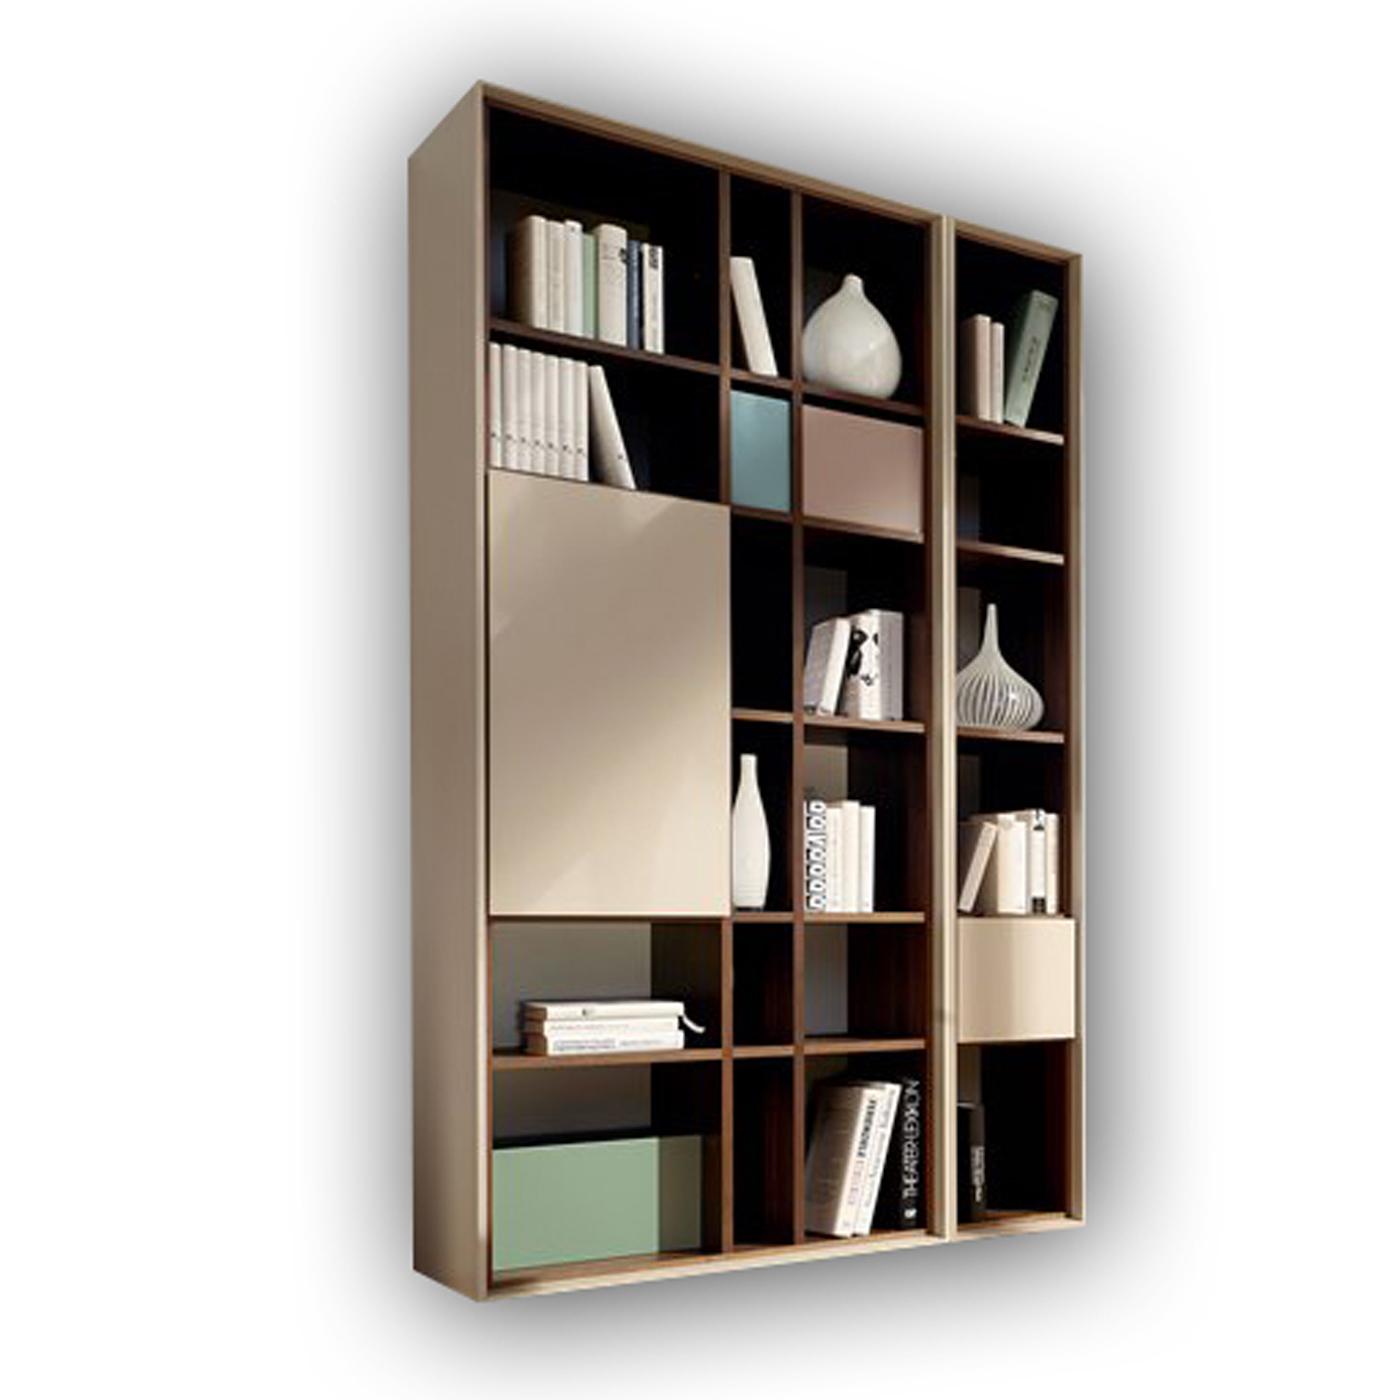 Scopia boekenkast